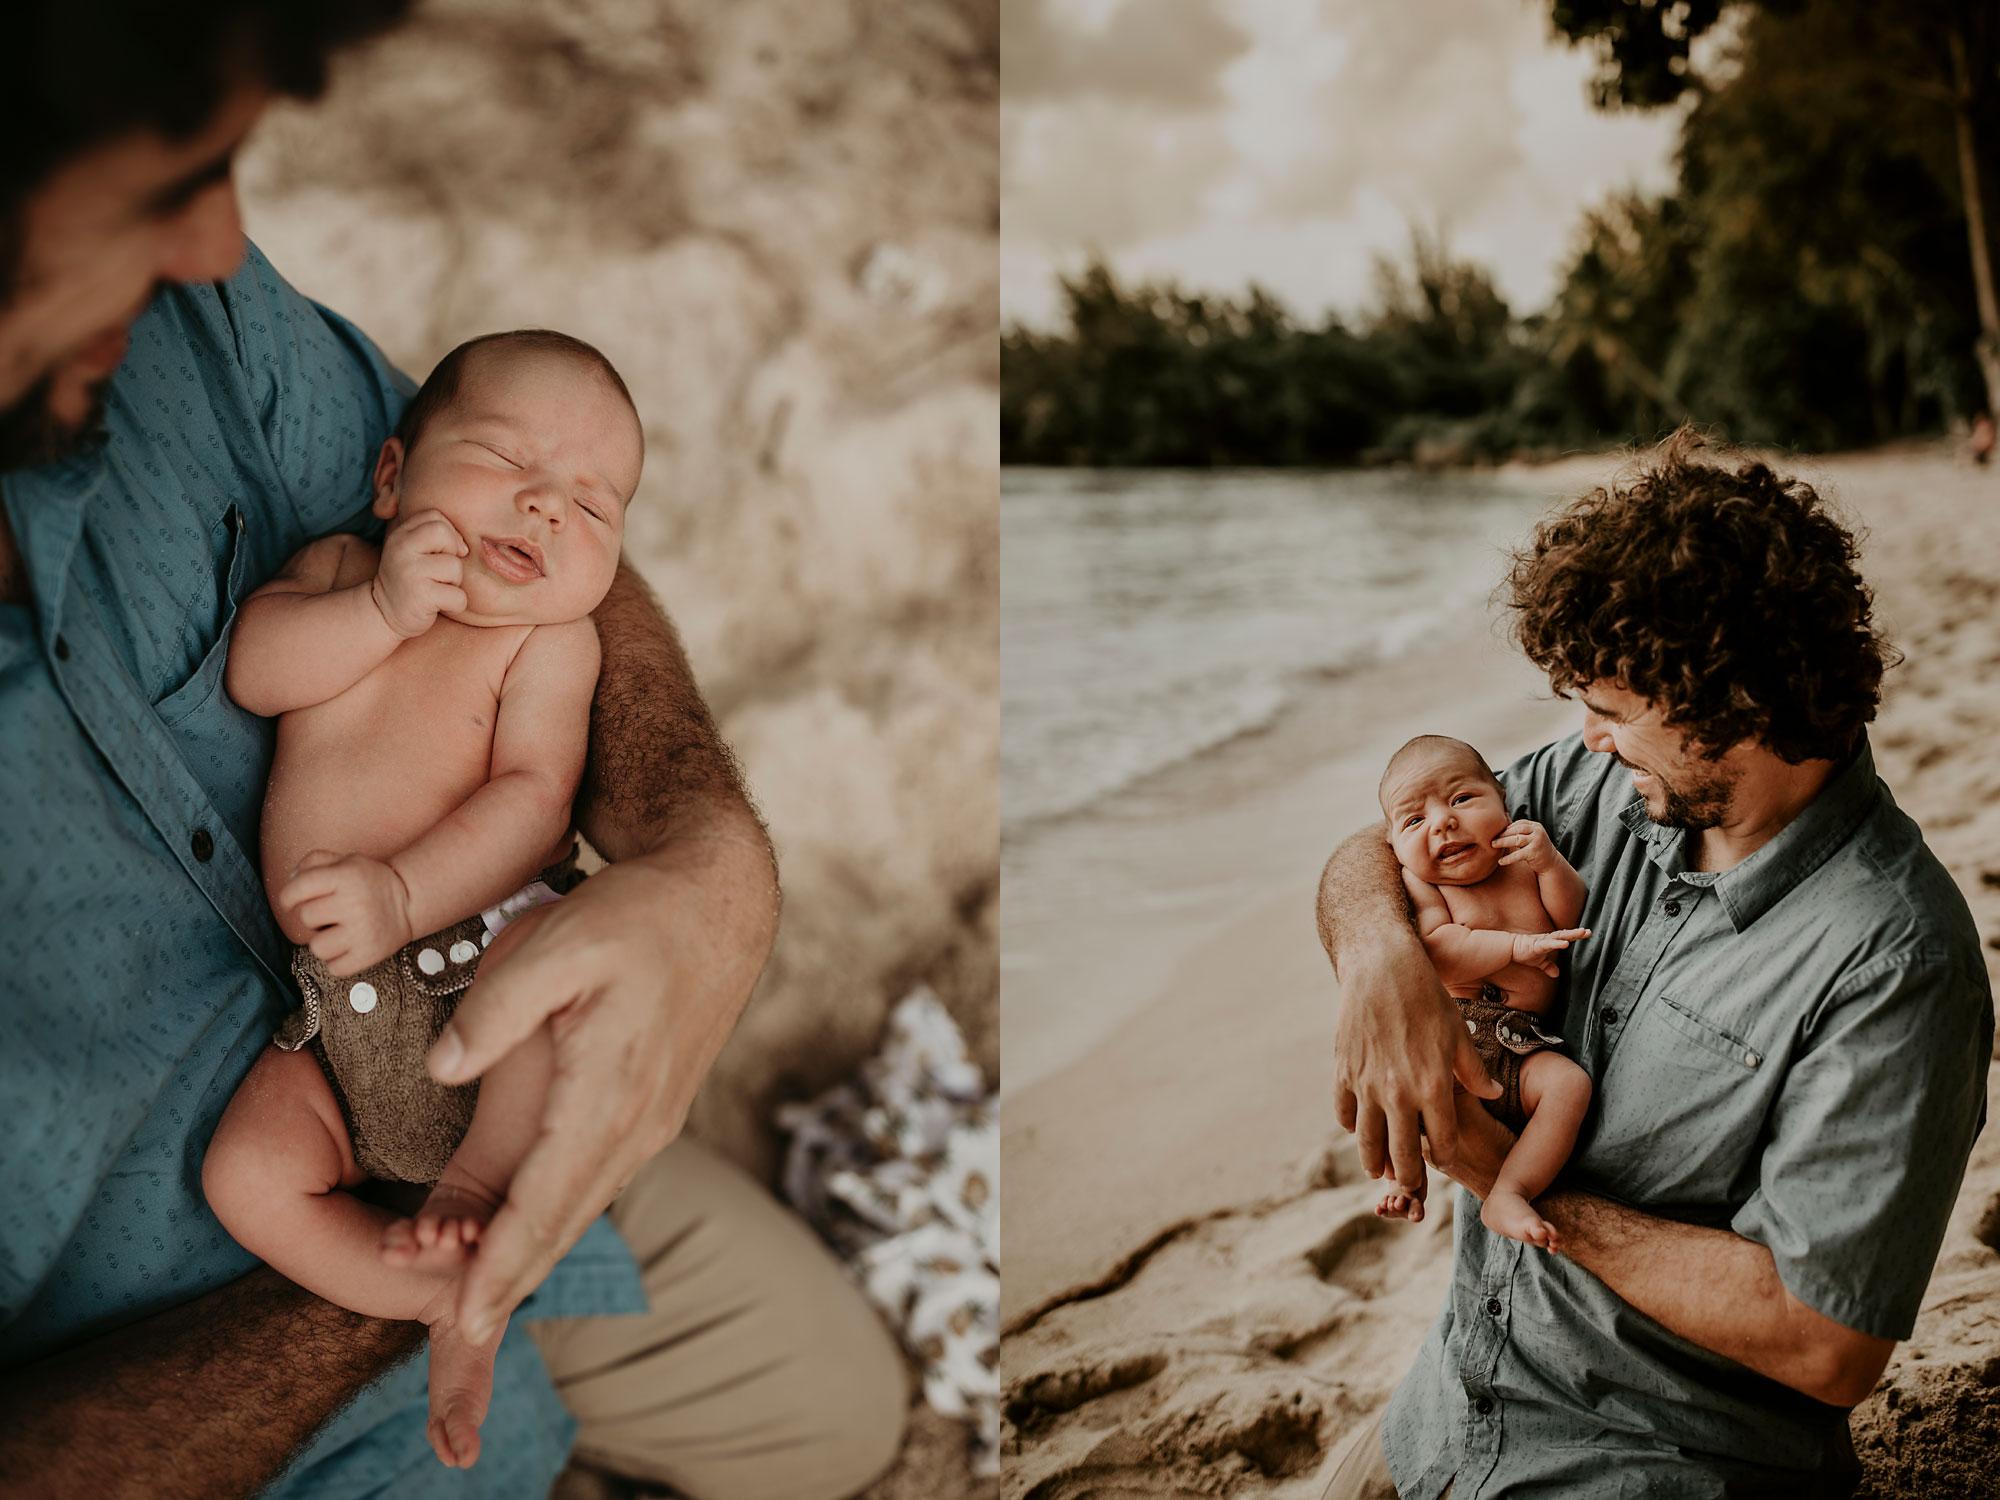 Hawaii-Outdoor-Newborn-Photography-10.jpg